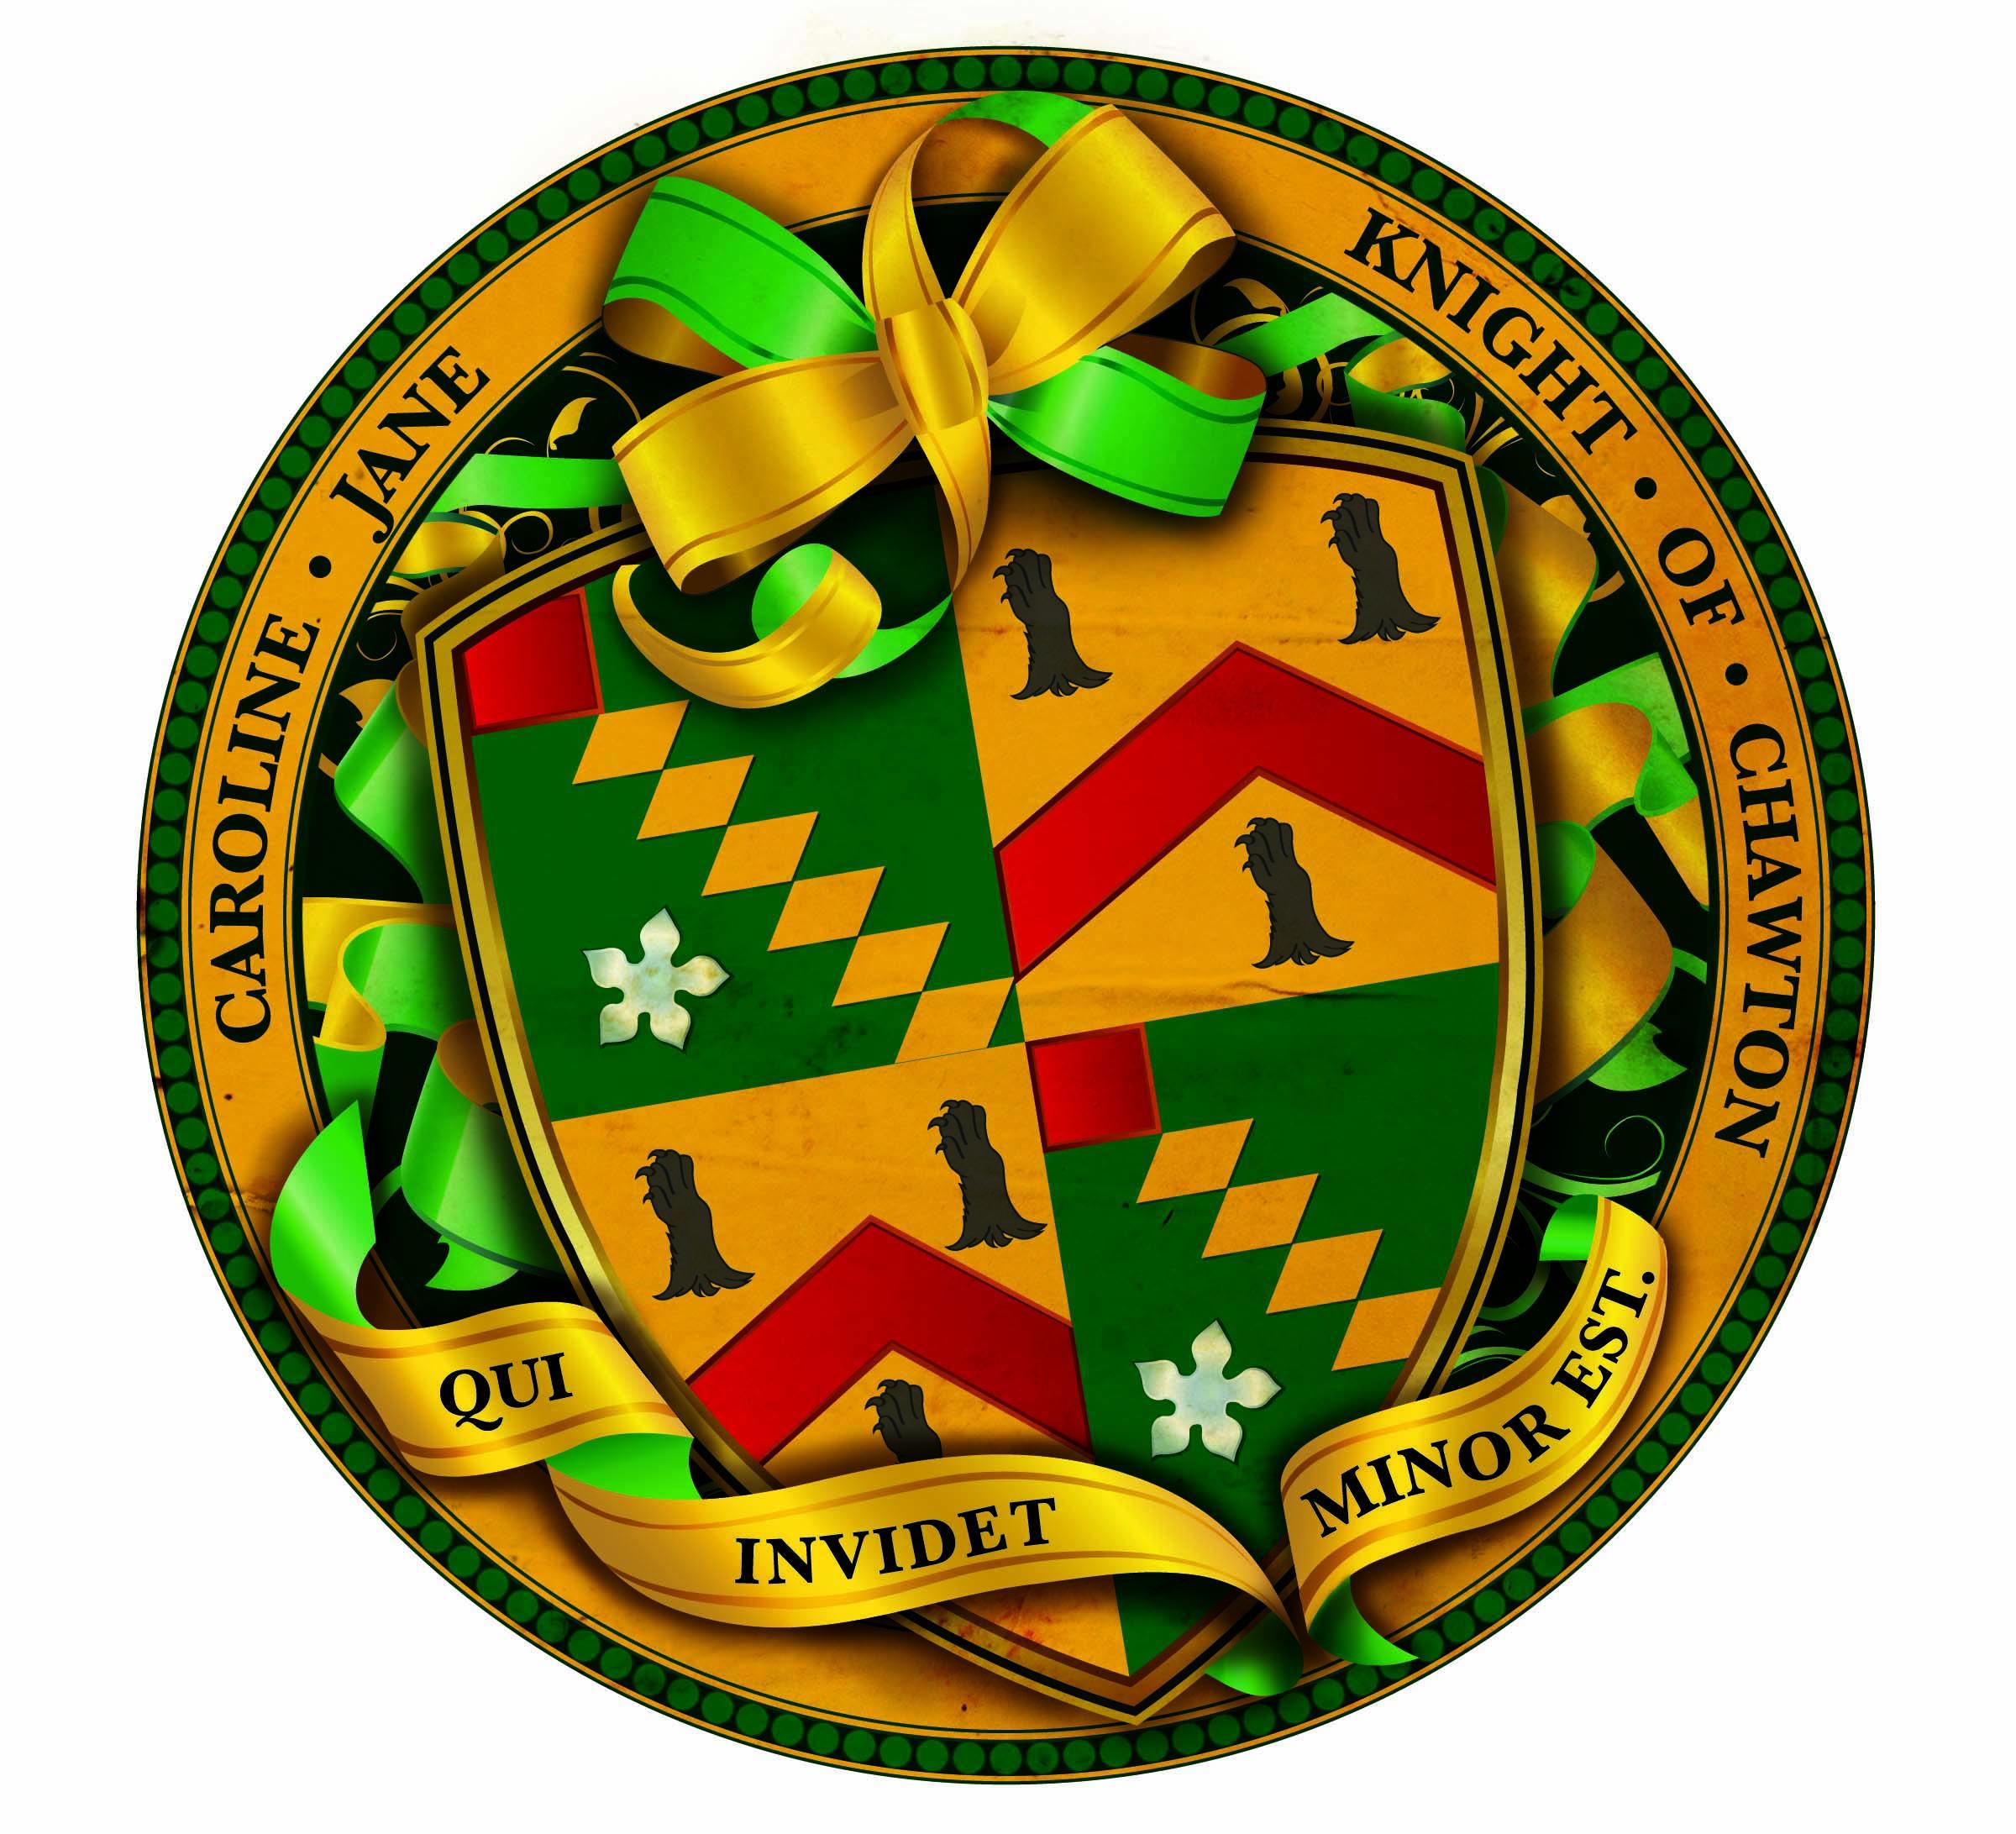 Caroline Jane Knight's heraldry  © Caroline Jane Knight